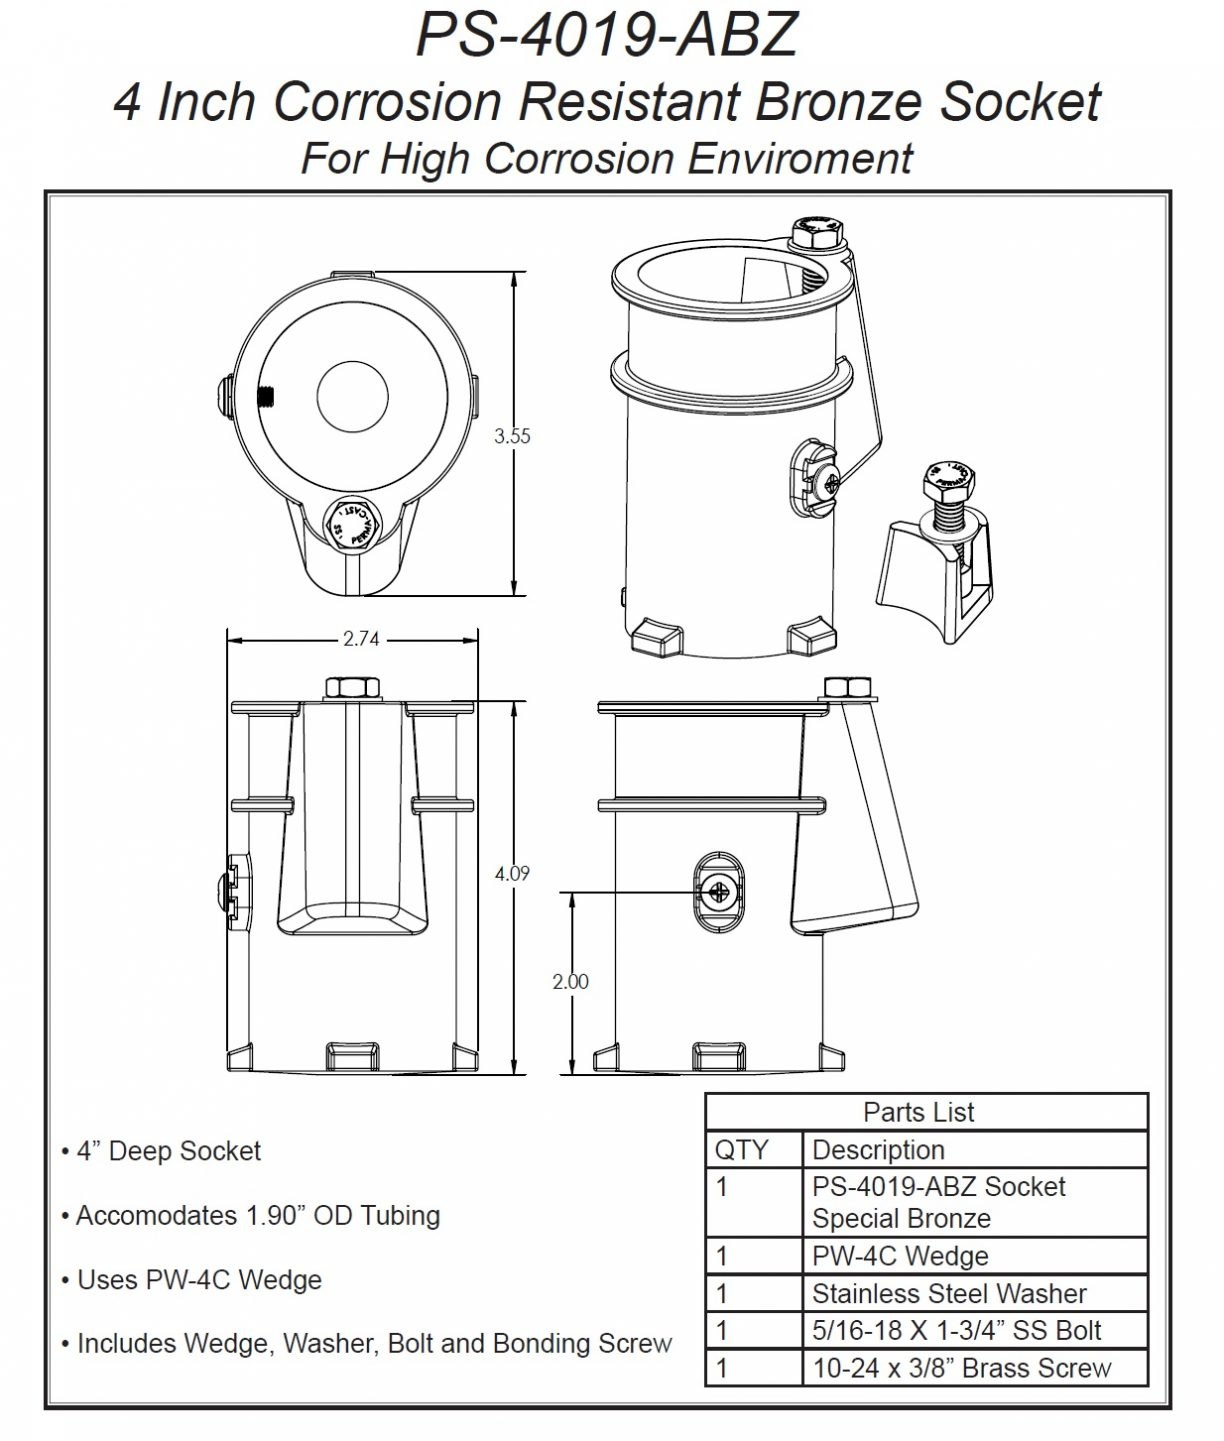 Sensational Hayward 1 5 Hp Pool Pump Wiring Diagram Download Wiring Cloud Monangrecoveryedborg